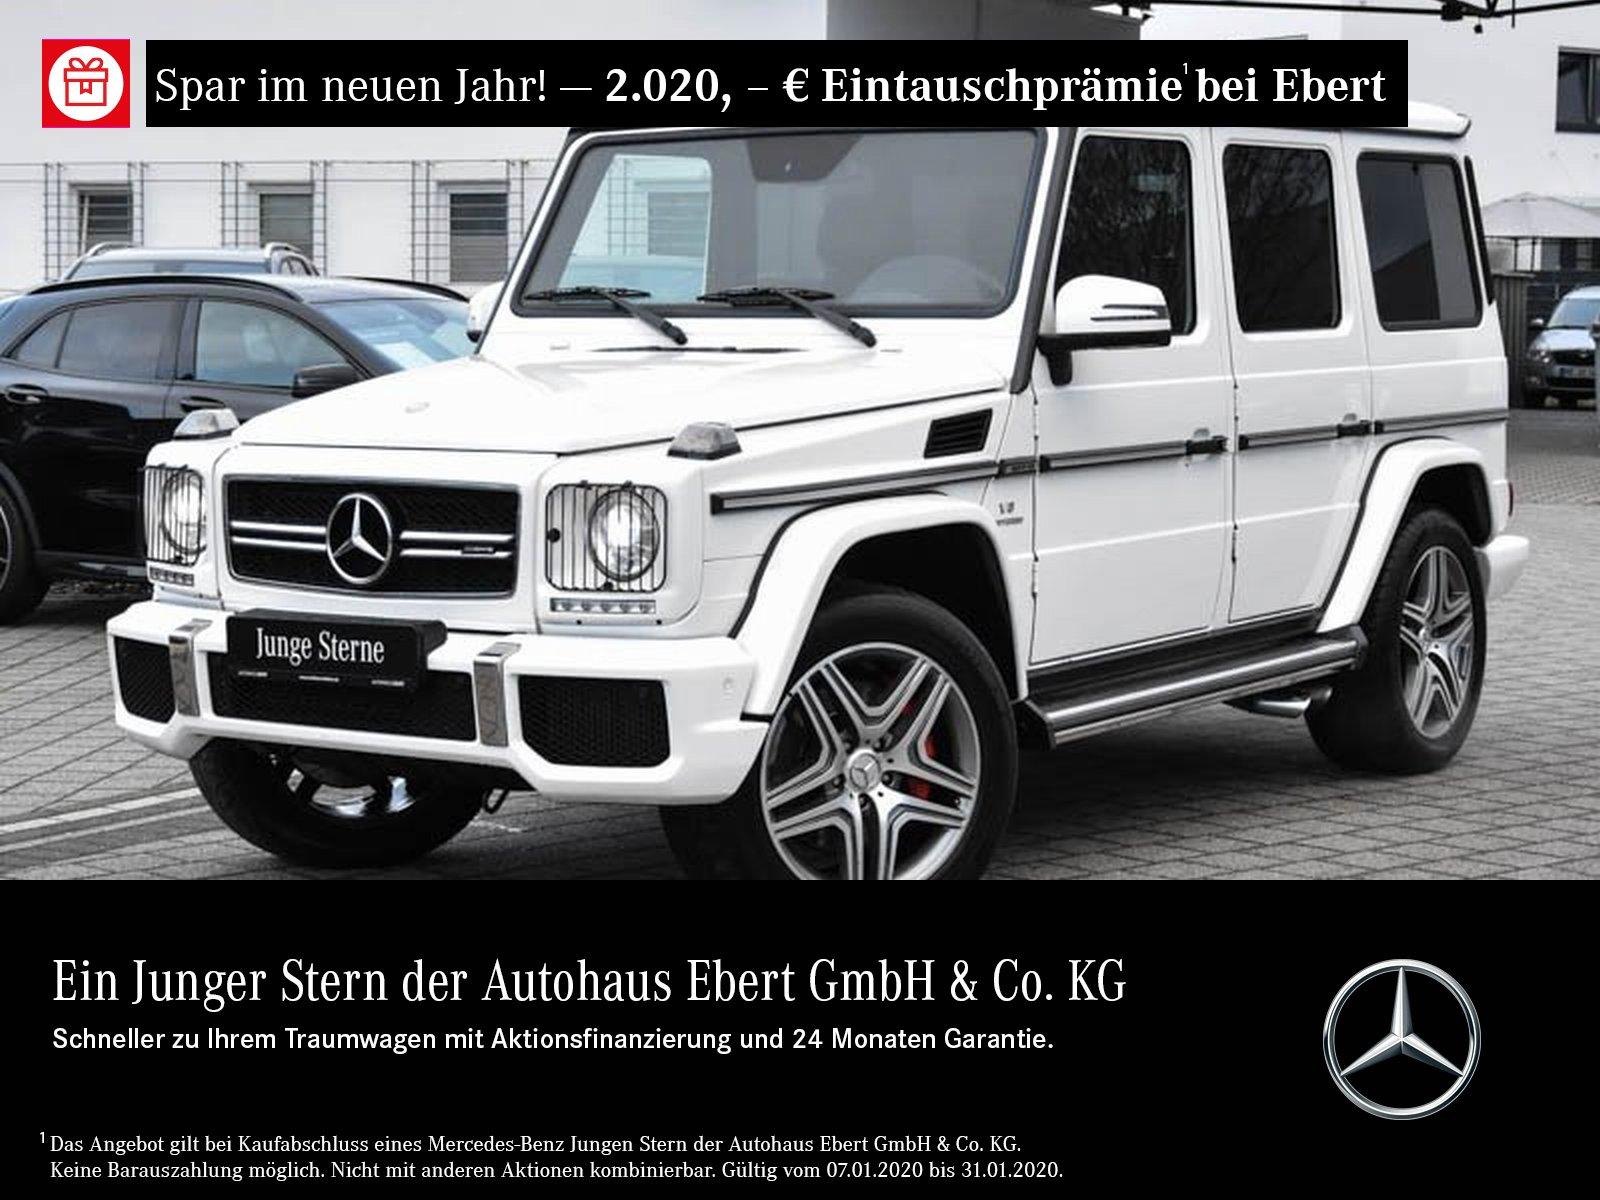 Mercedes-Benz G 63 AMG COMAND+STDHZG+BI-XENON+ESHD+KAMERA, Jahr 2016, petrol